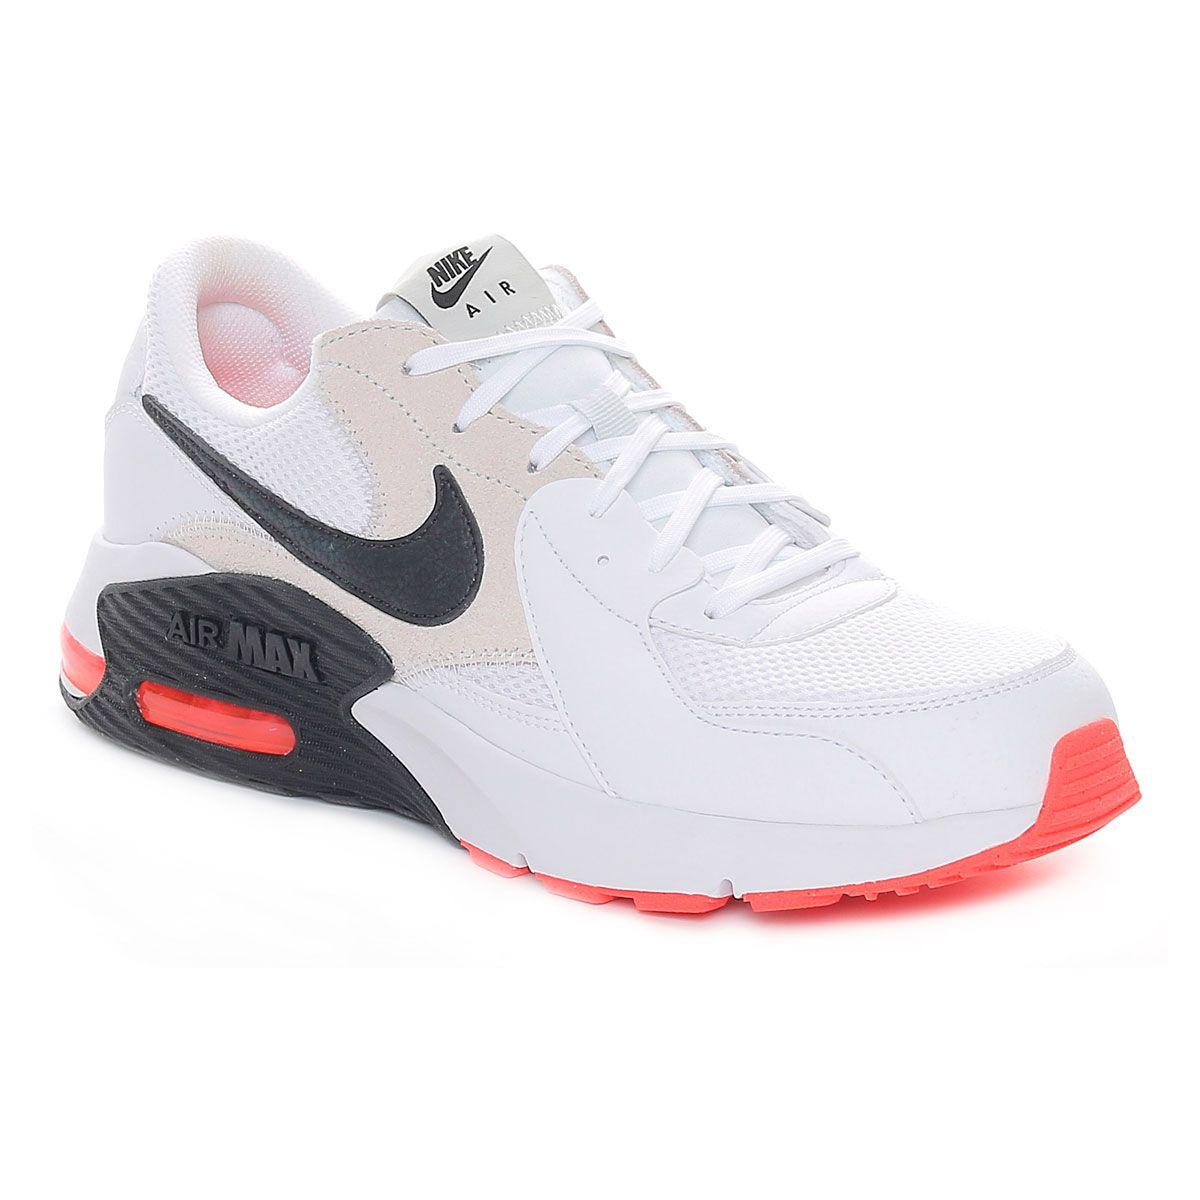 Nike Air Max Excee Uomo Bianco Nero